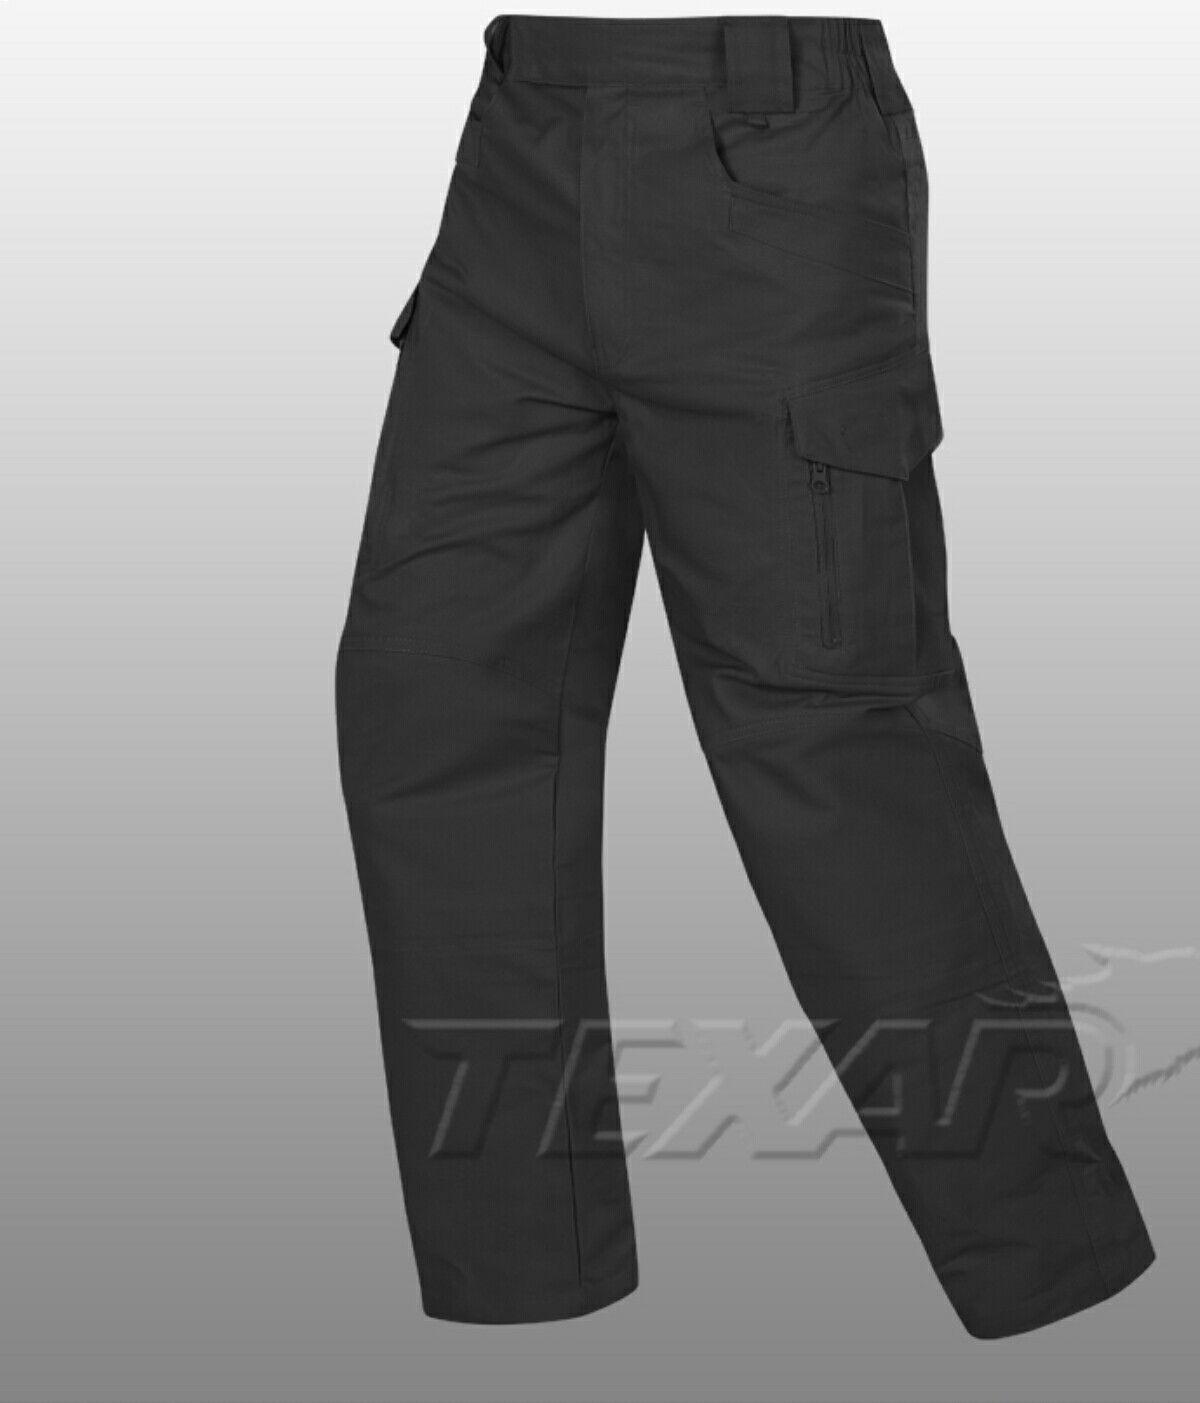 09cf8cdbf57 Kalhoty Texar Elite pro černé